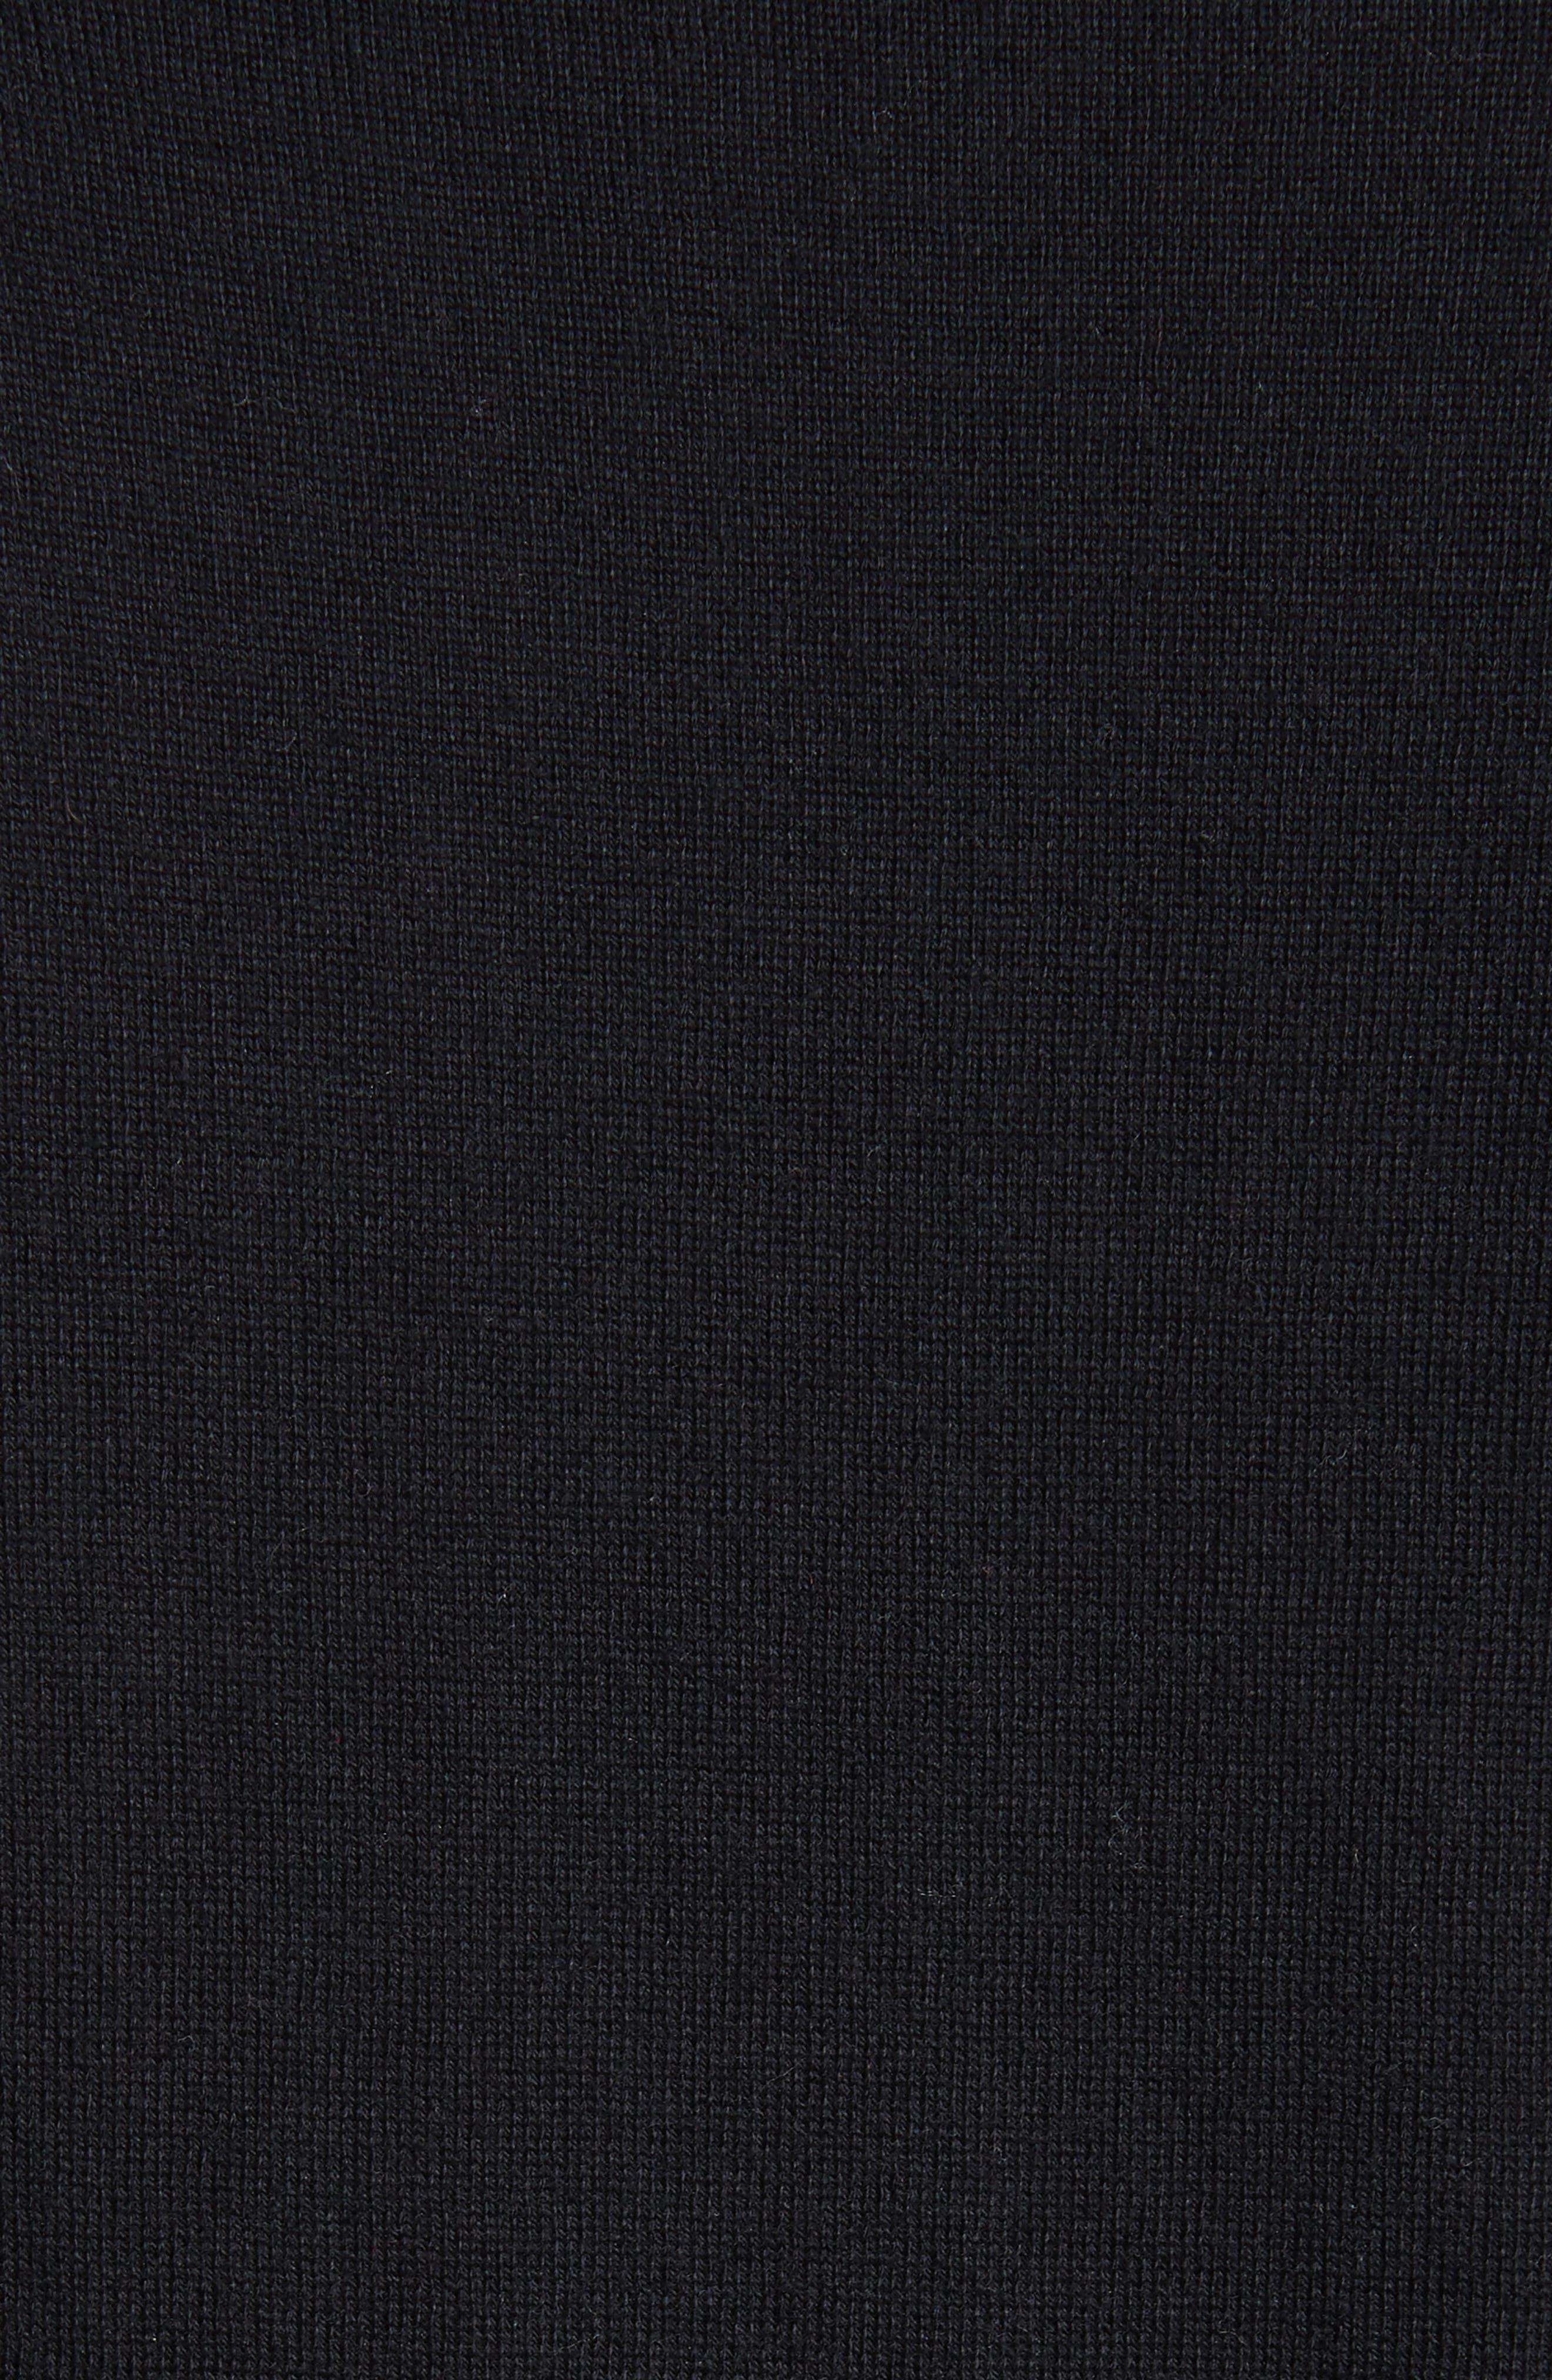 bloom floral lace cardigan,                             Alternate thumbnail 5, color,                             Black